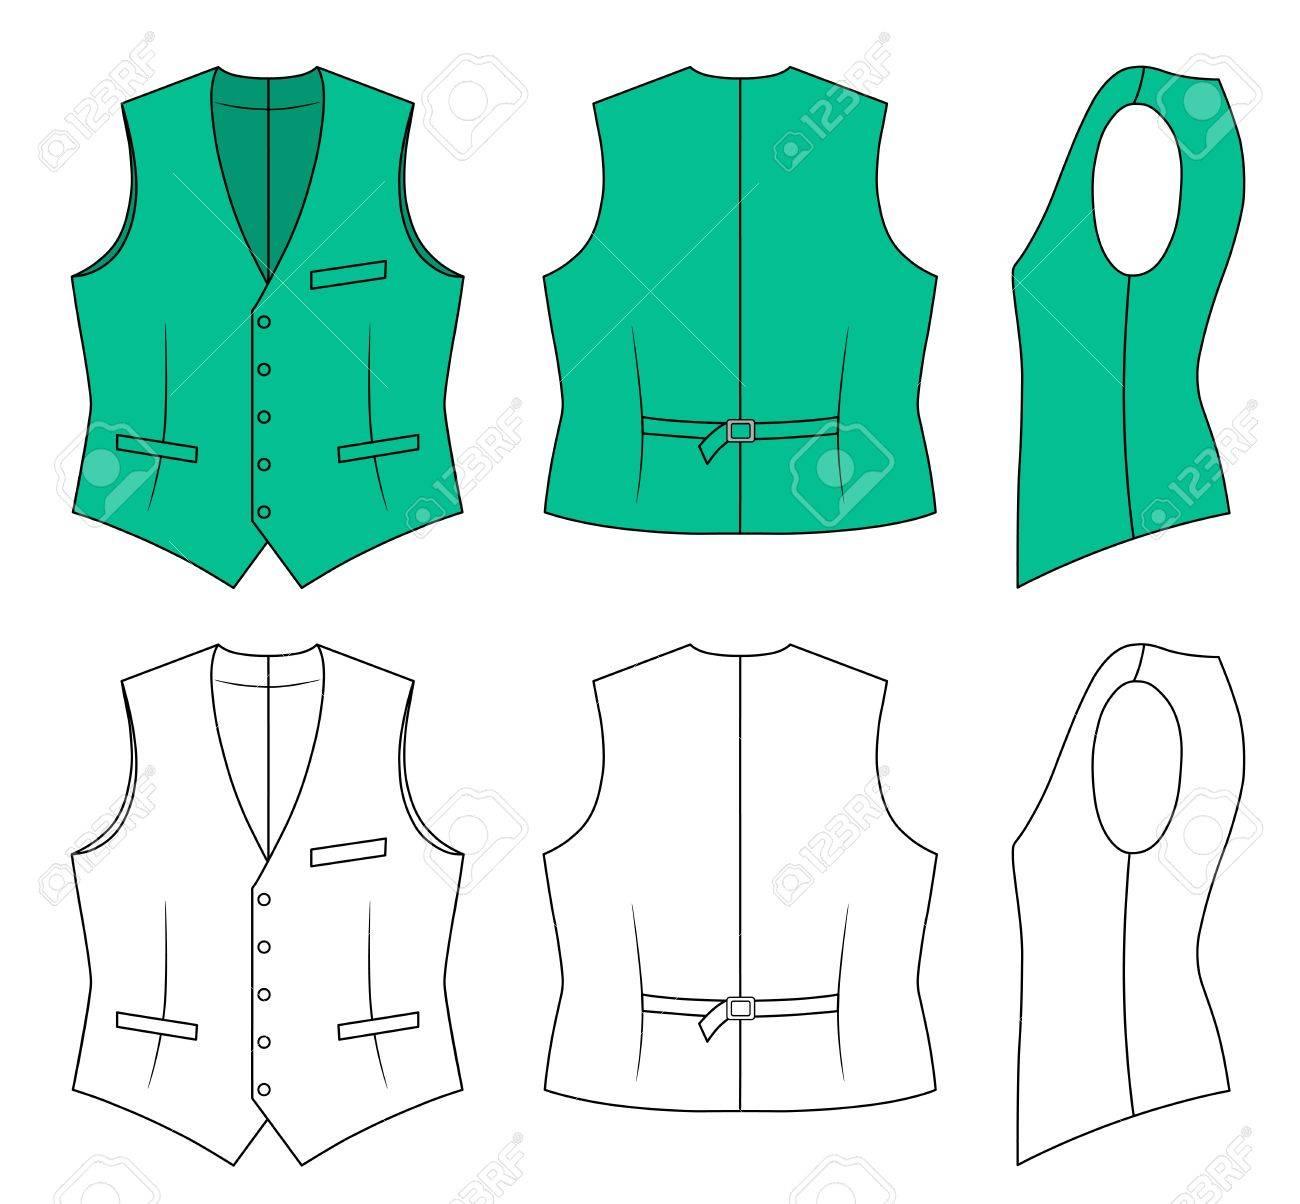 Man green waistcoat - 11357360